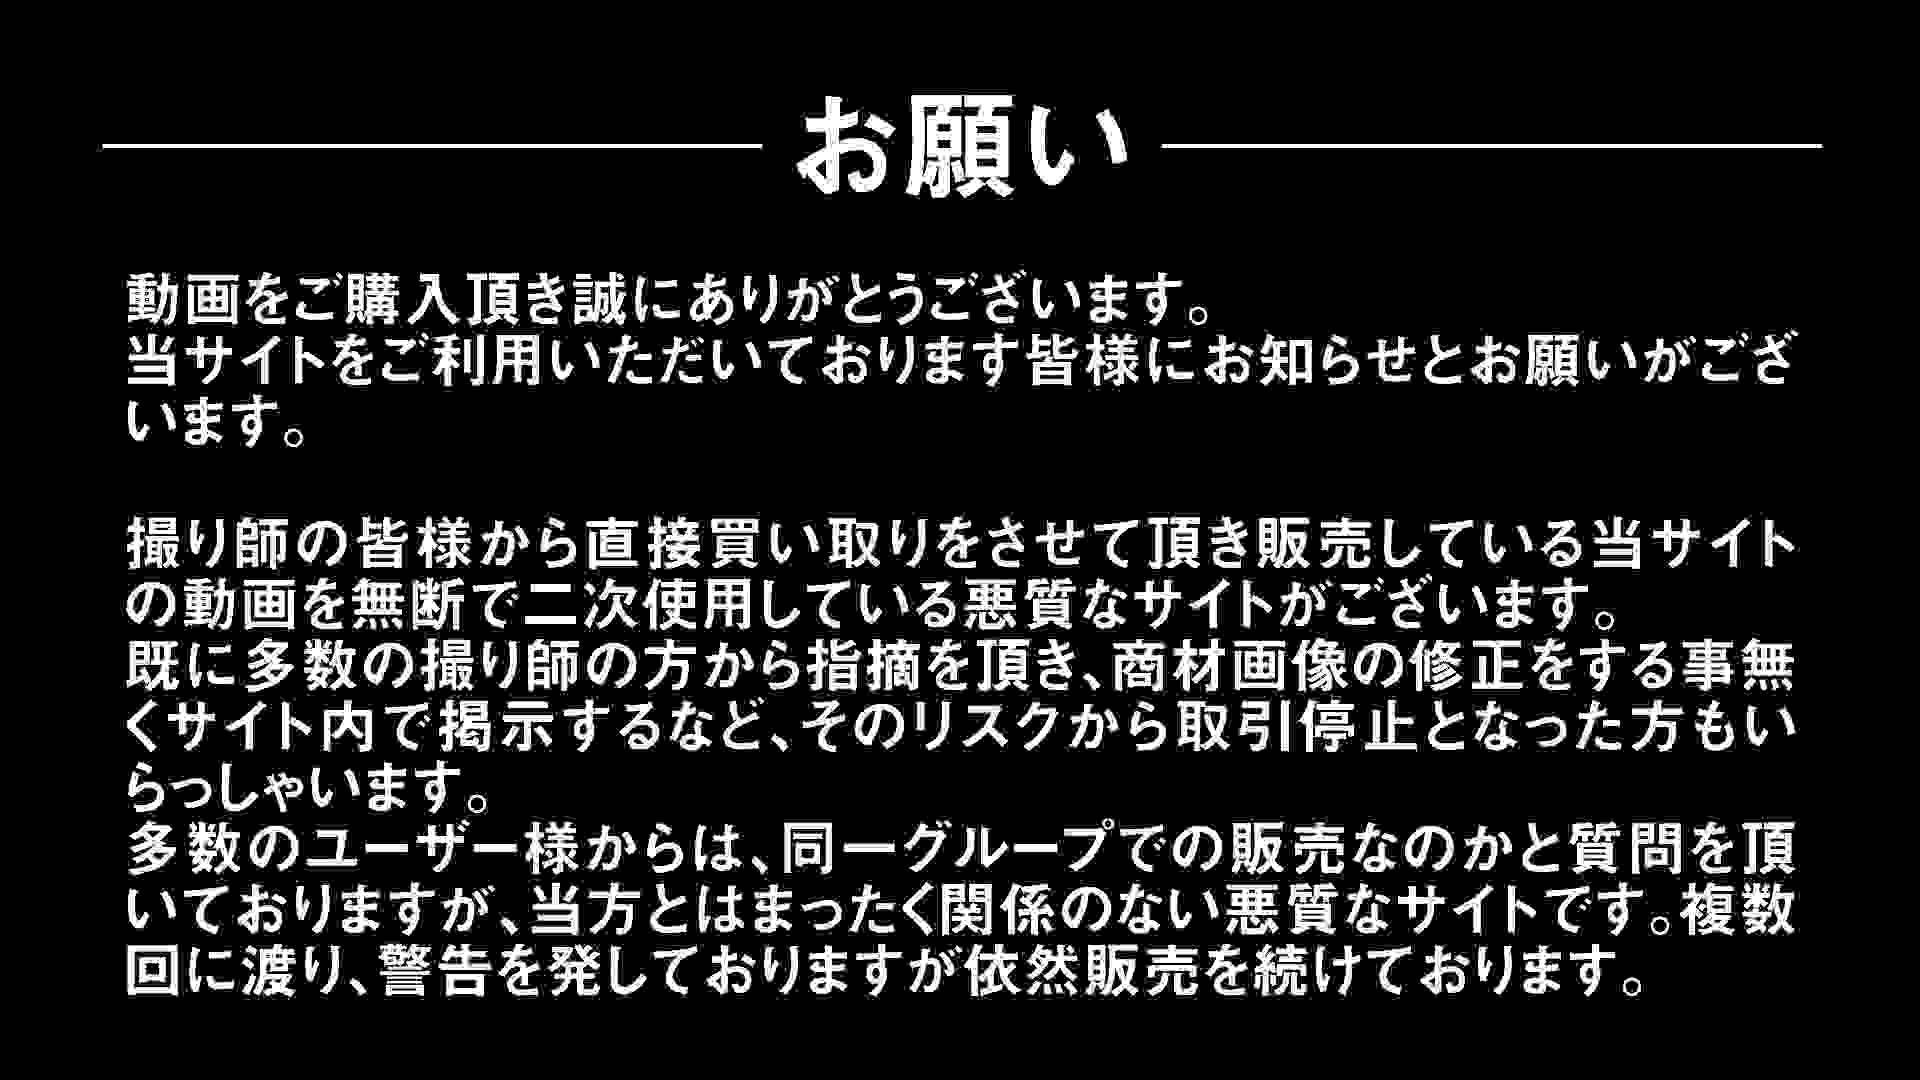 Aquaな露天風呂Vol.299 盗撮シリーズ | 露天風呂編  82PIX 3